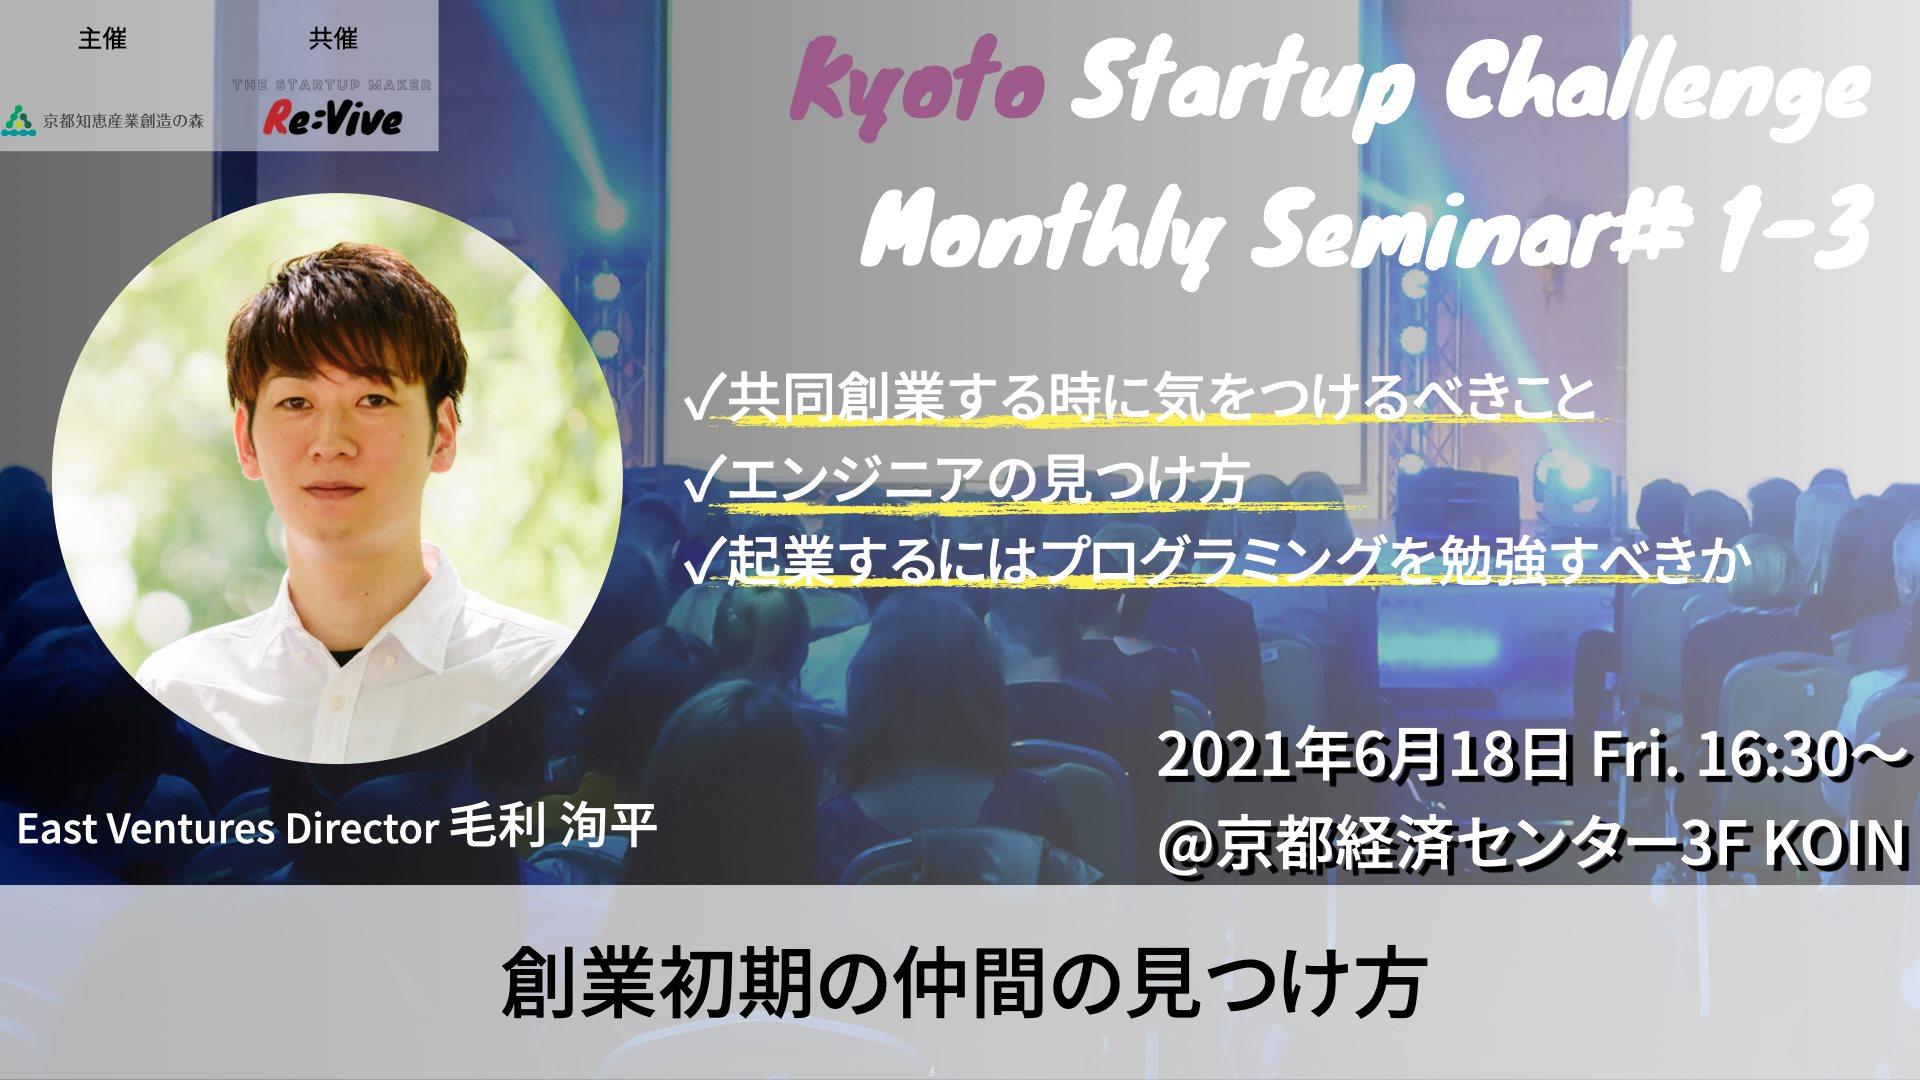 Kyoto Startup Challenge / Seminar ③-「創業初期の仲間の見つけ方」-(2021/6/18開催)